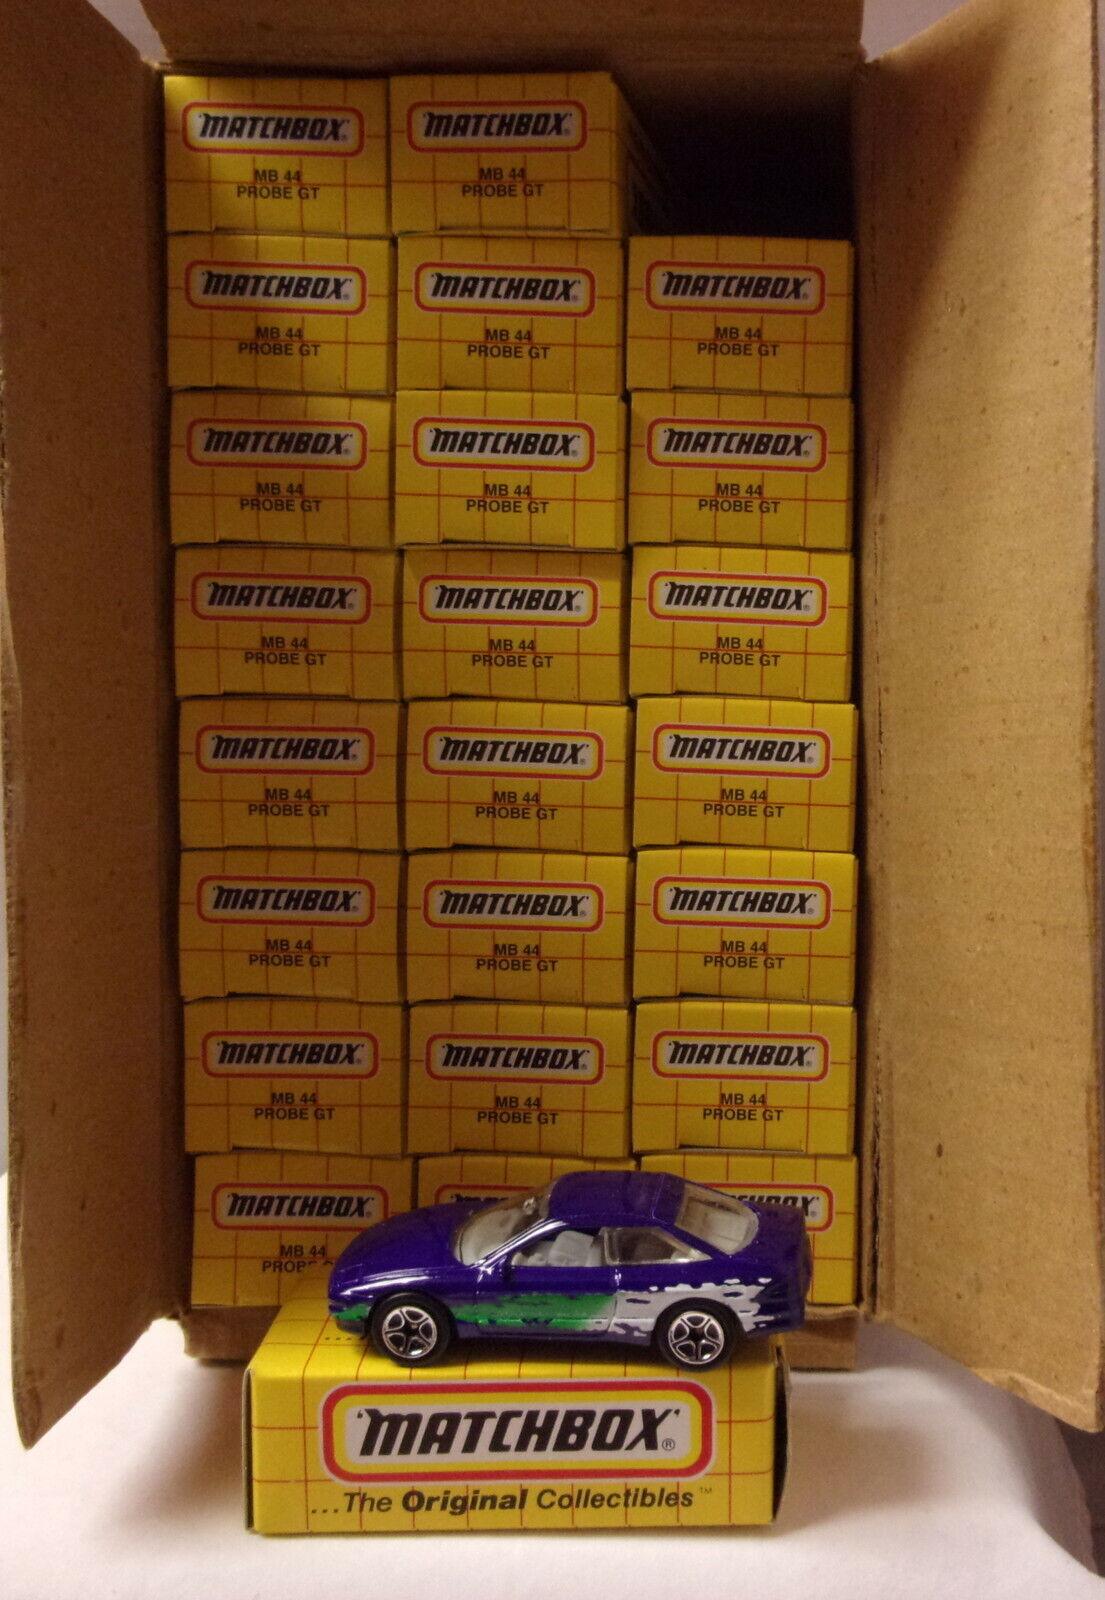 KKar Matchbox -  Yellow Box - MB44 Ford Probe - Purple - Case Lot